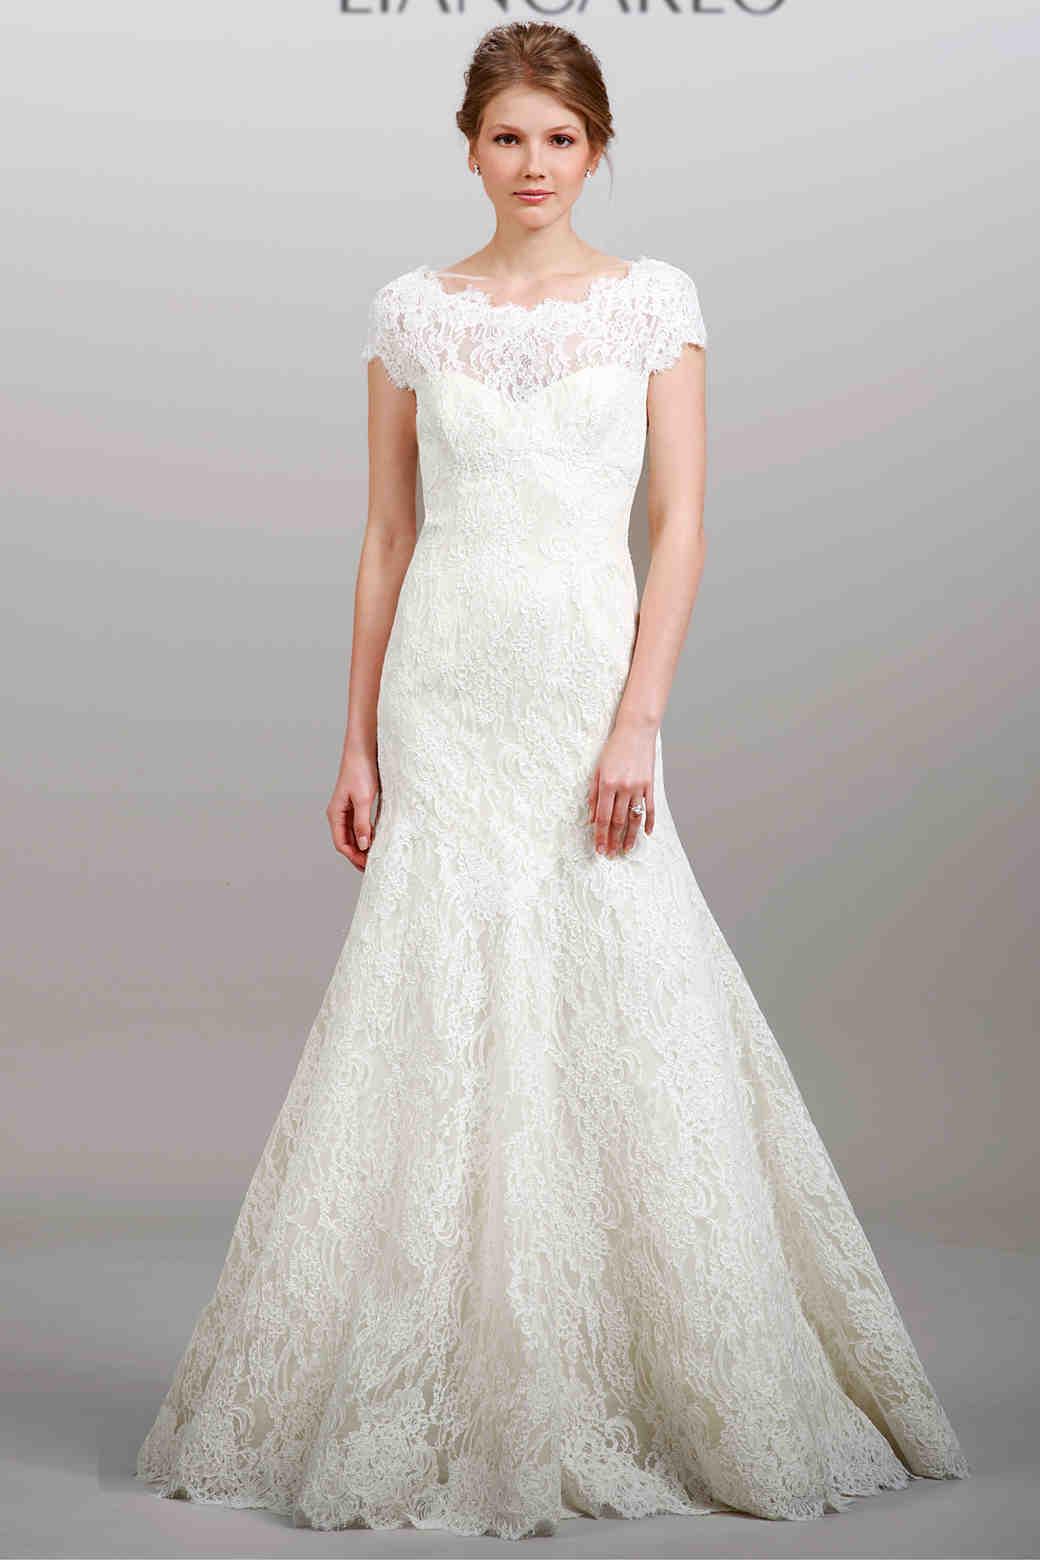 Illusion wedding dresses spring 2014 martha stewart weddings the illusionists junglespirit Choice Image